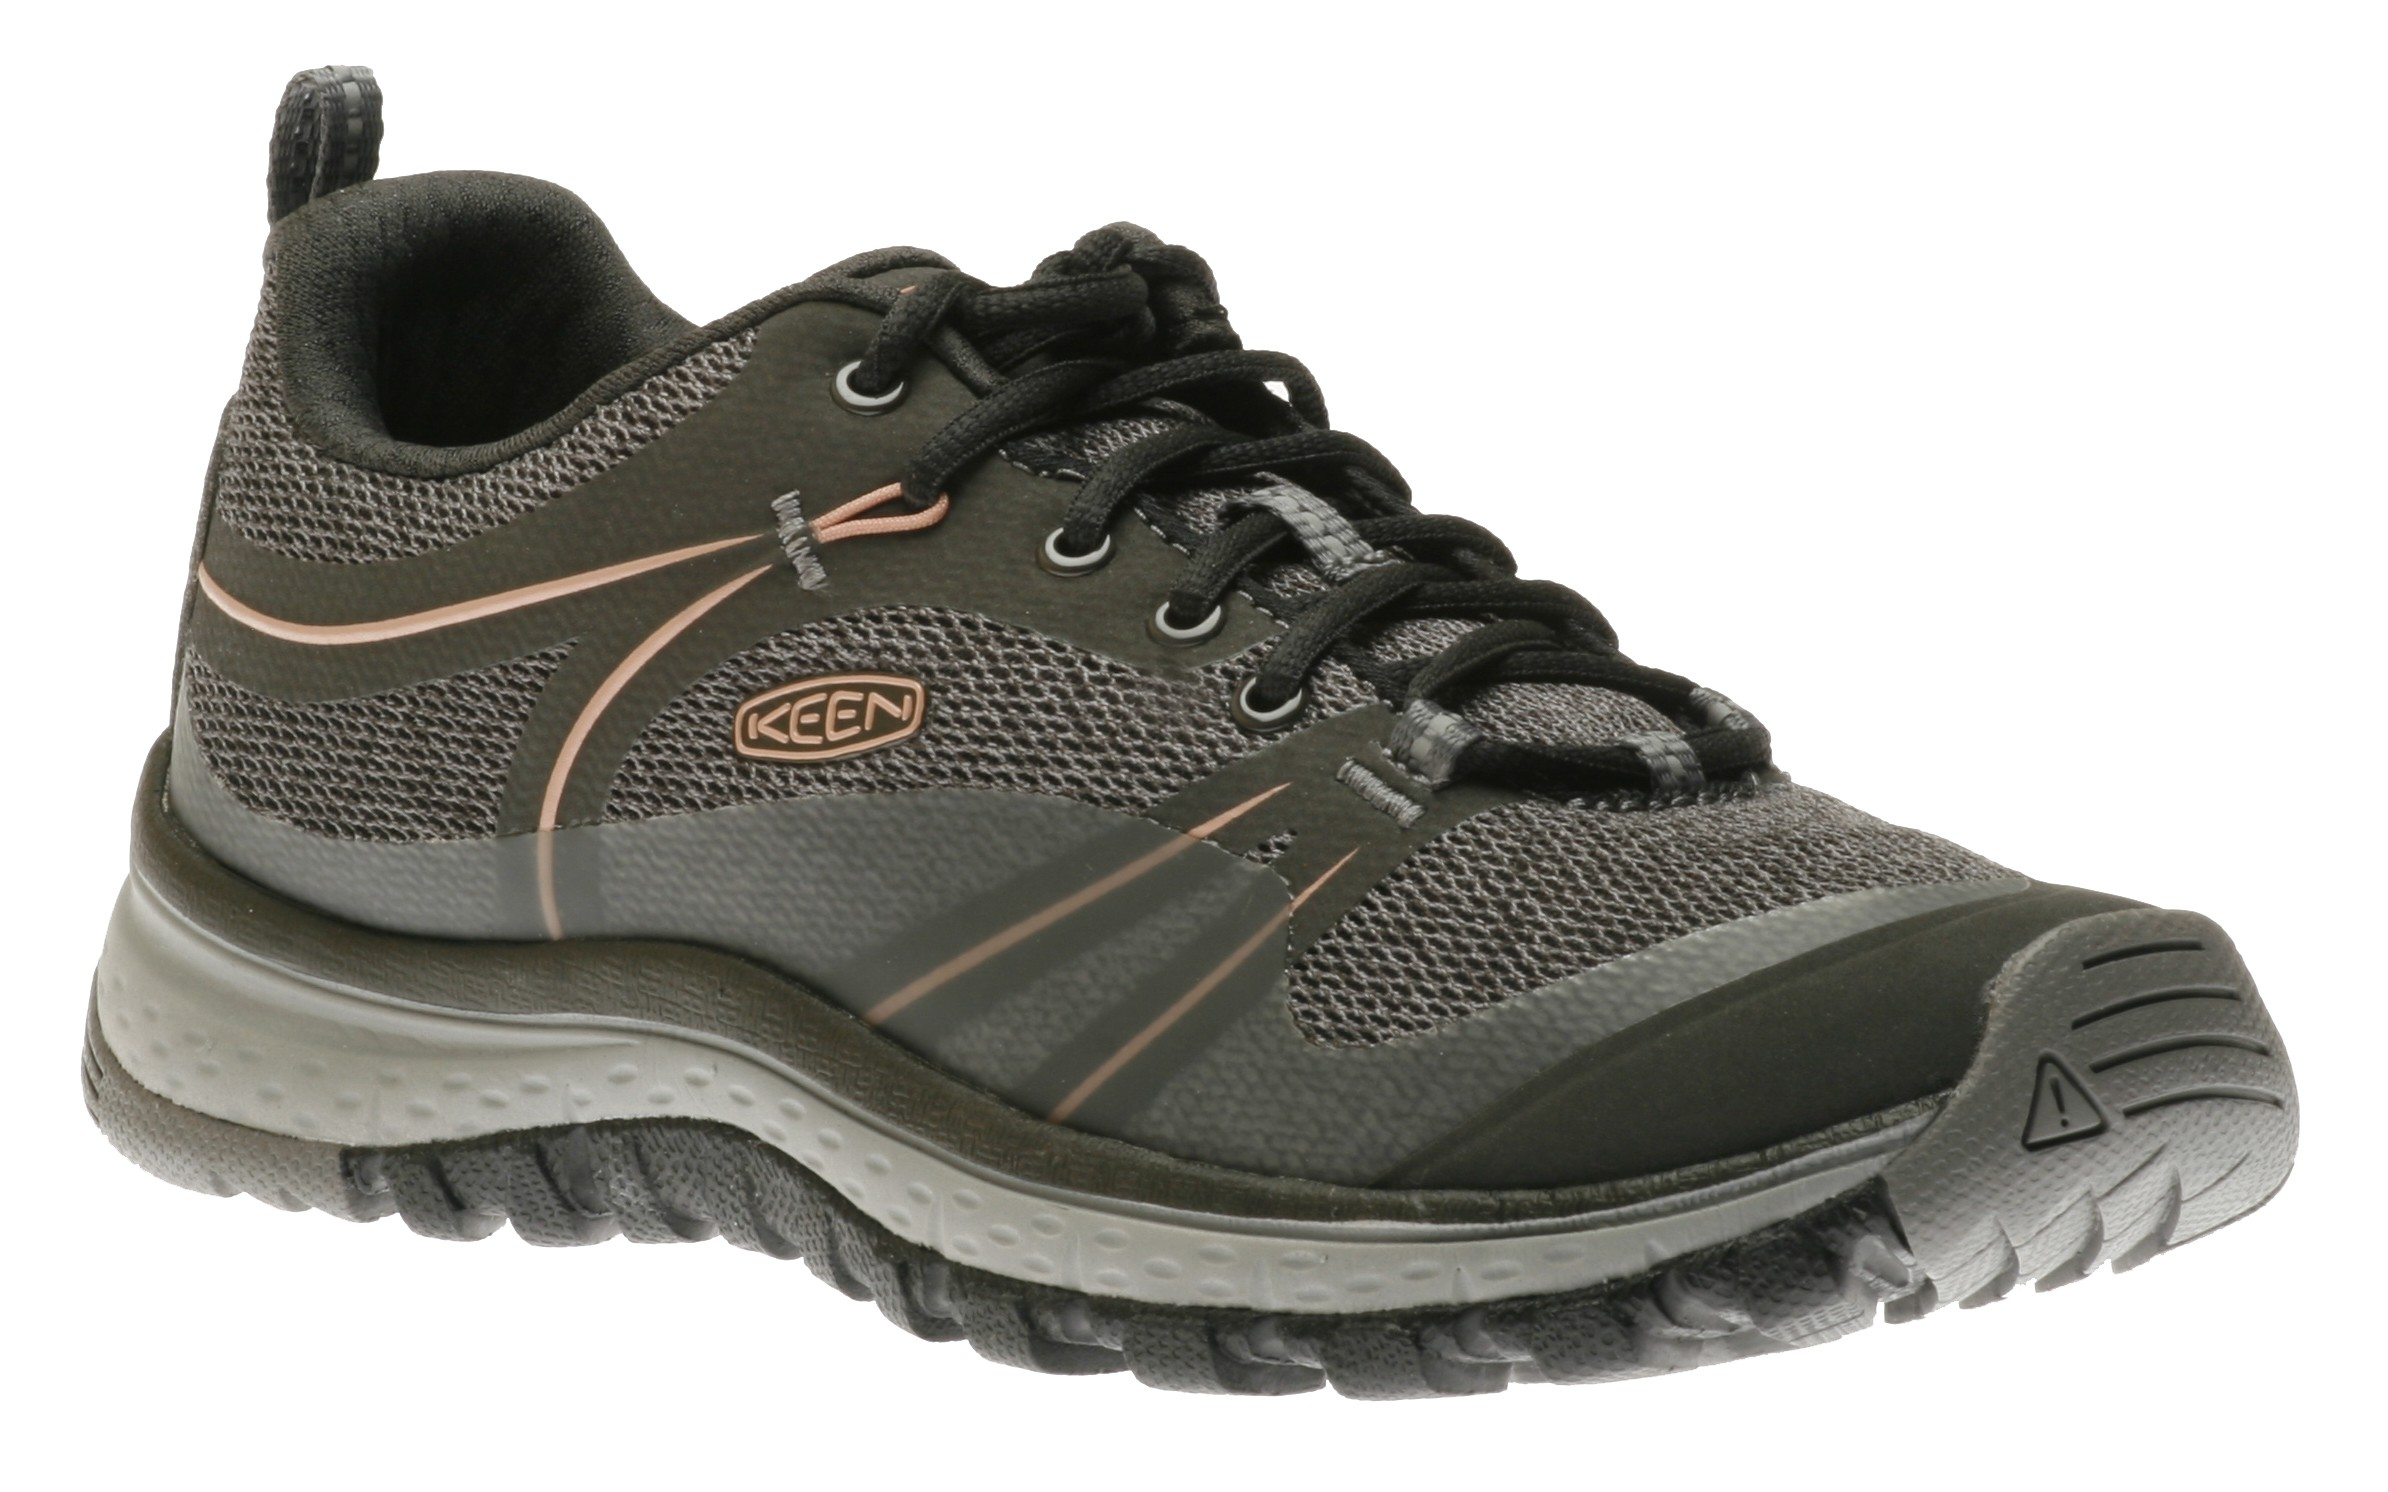 keens shoes terradora raven msnhdrx